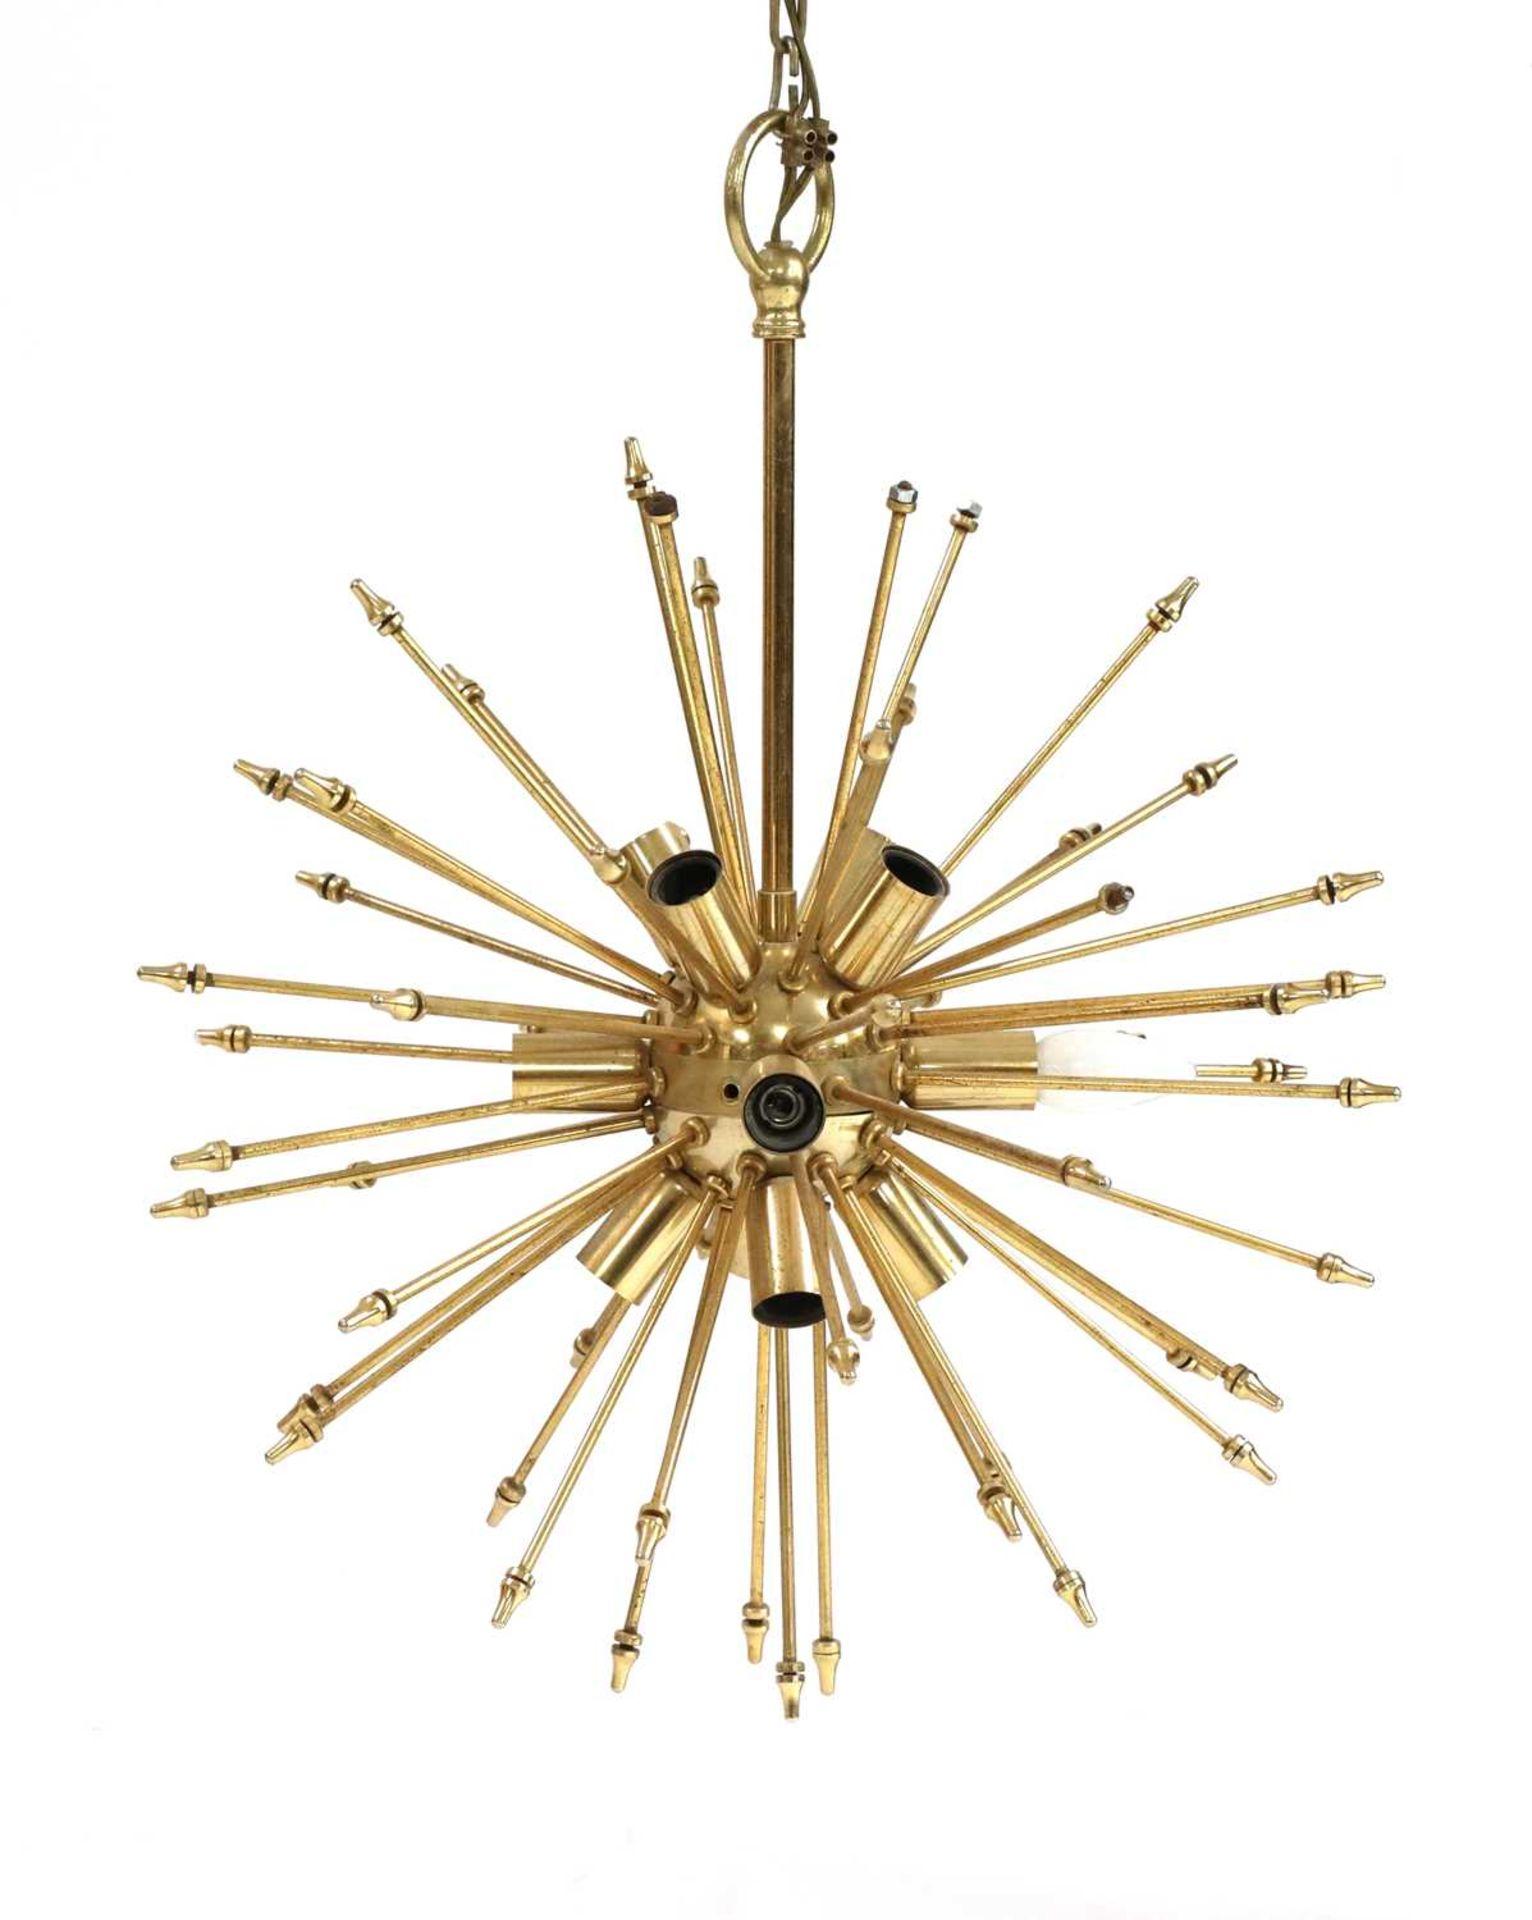 An Italian brass globe ceiling light,